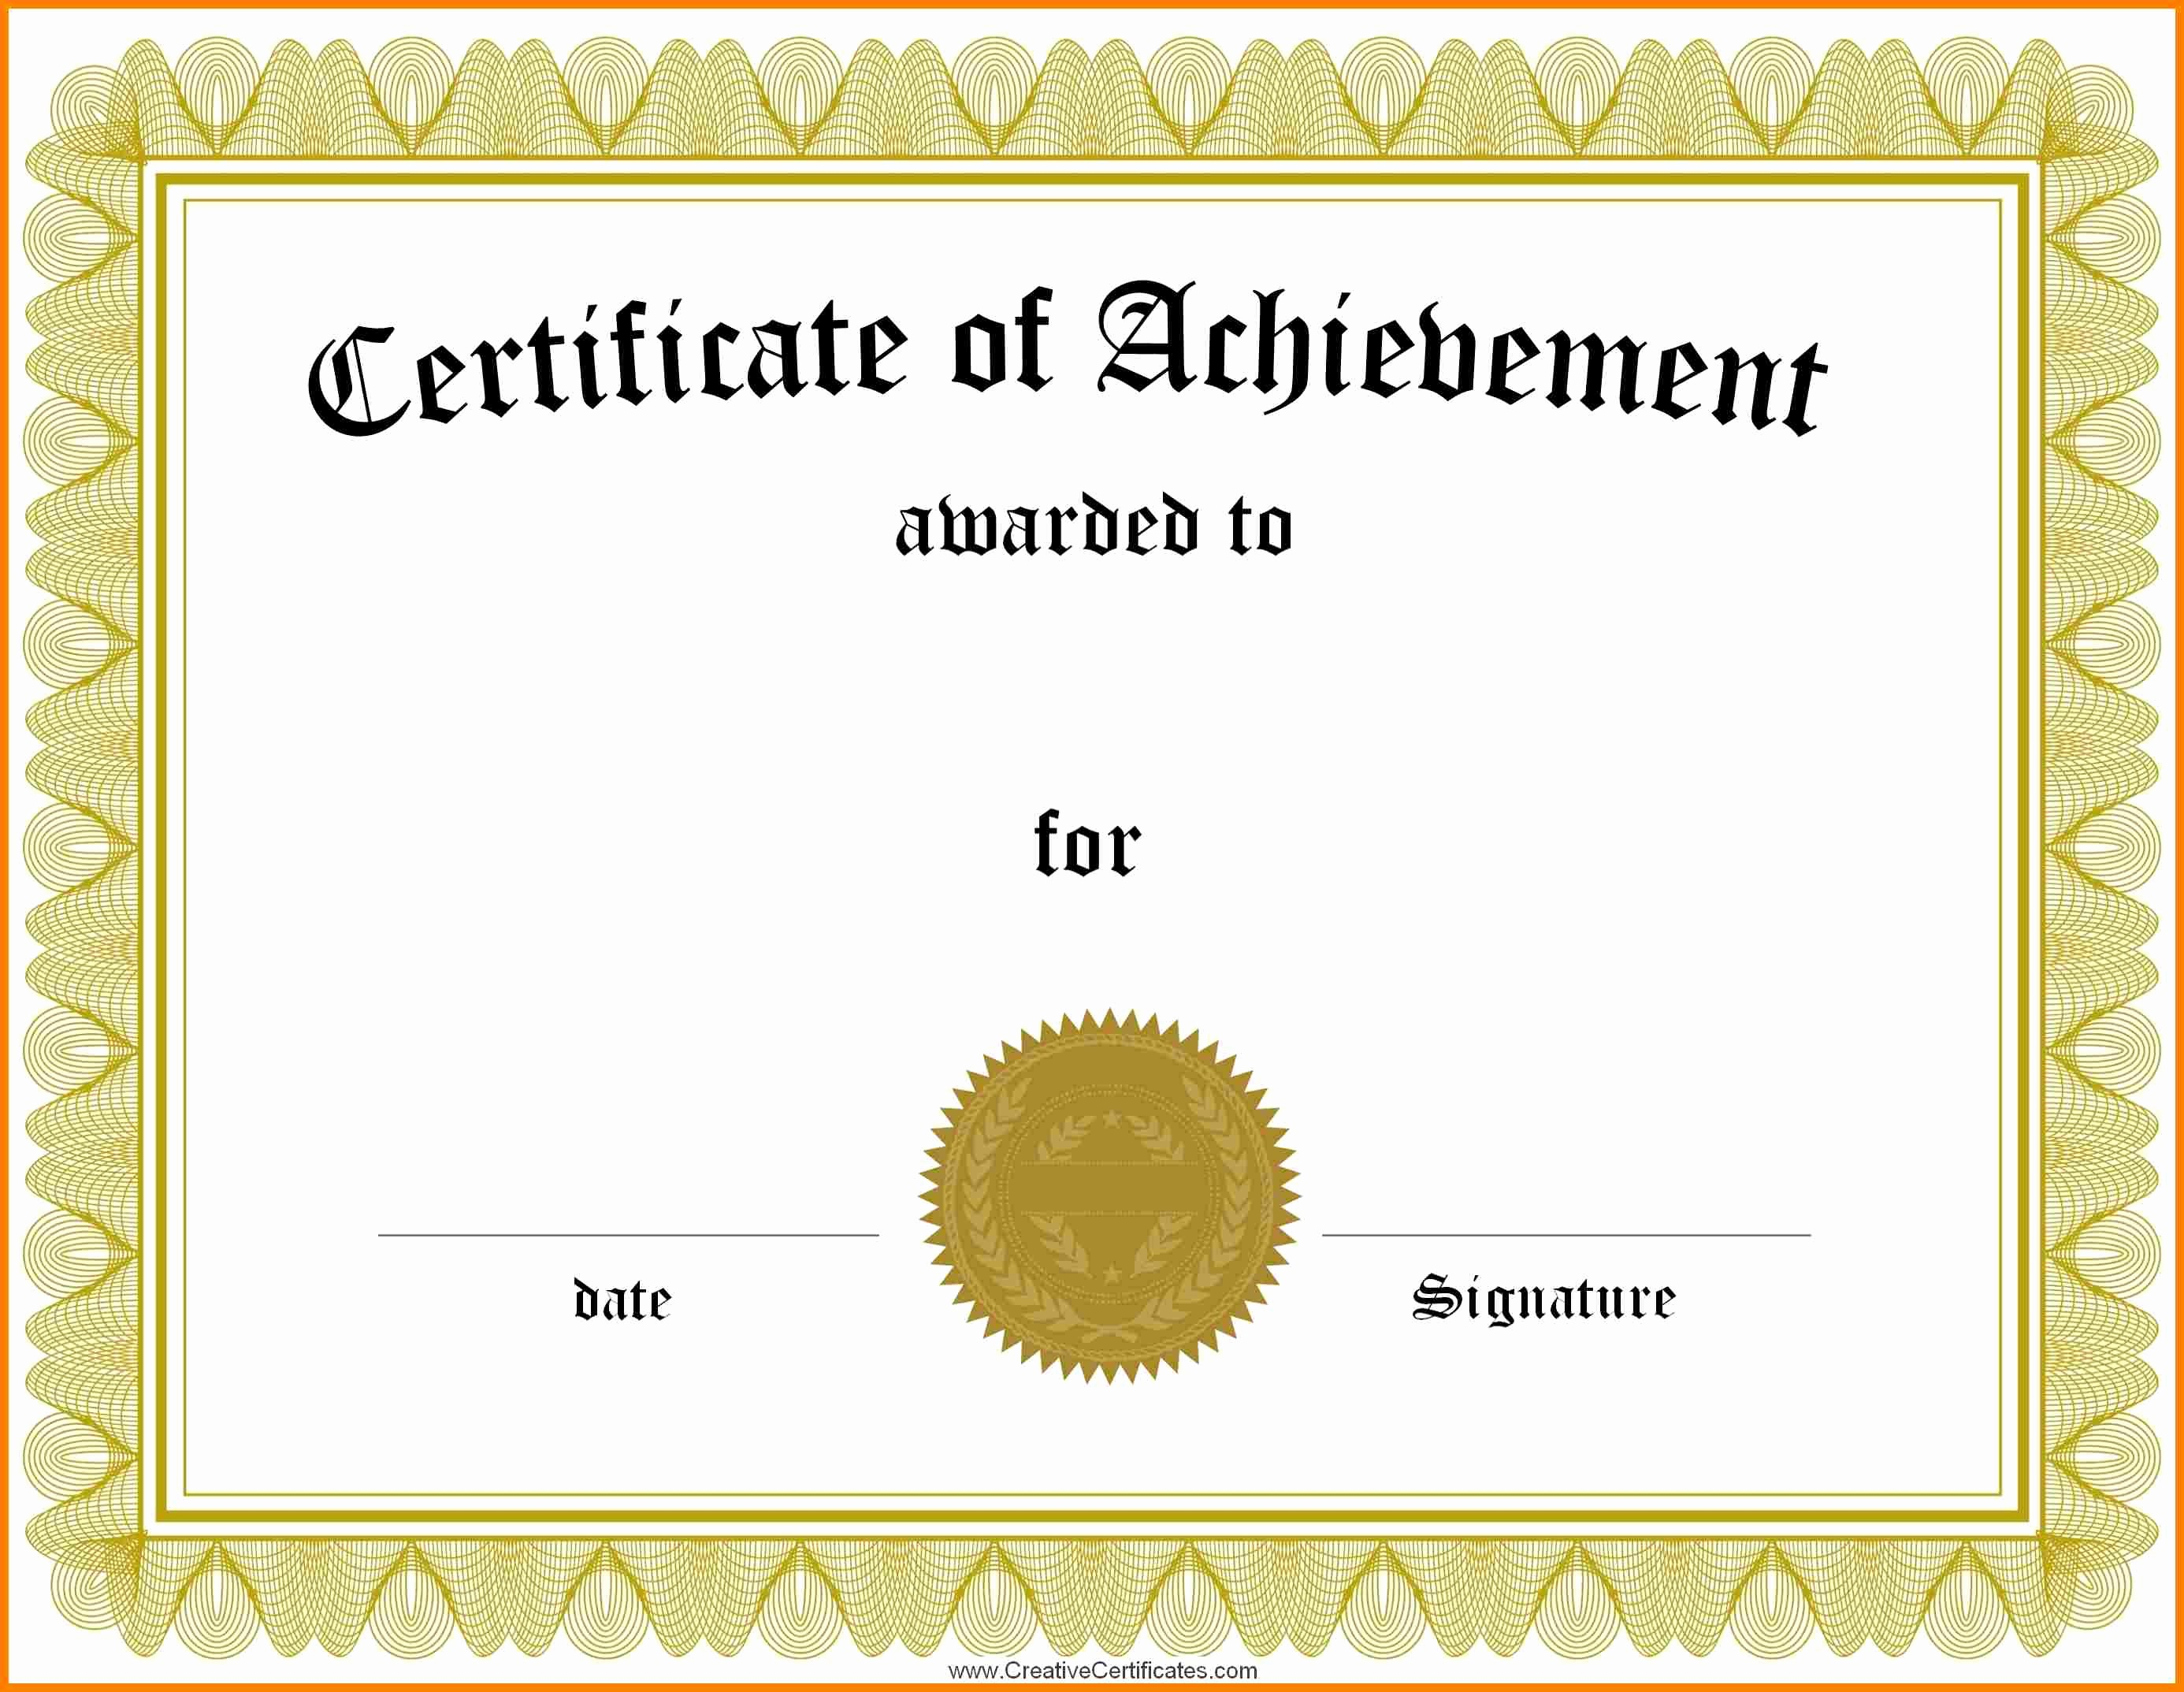 Dance Certificate Templates for Word Inspirational Blank Certificate forms Portablegasgrillweber